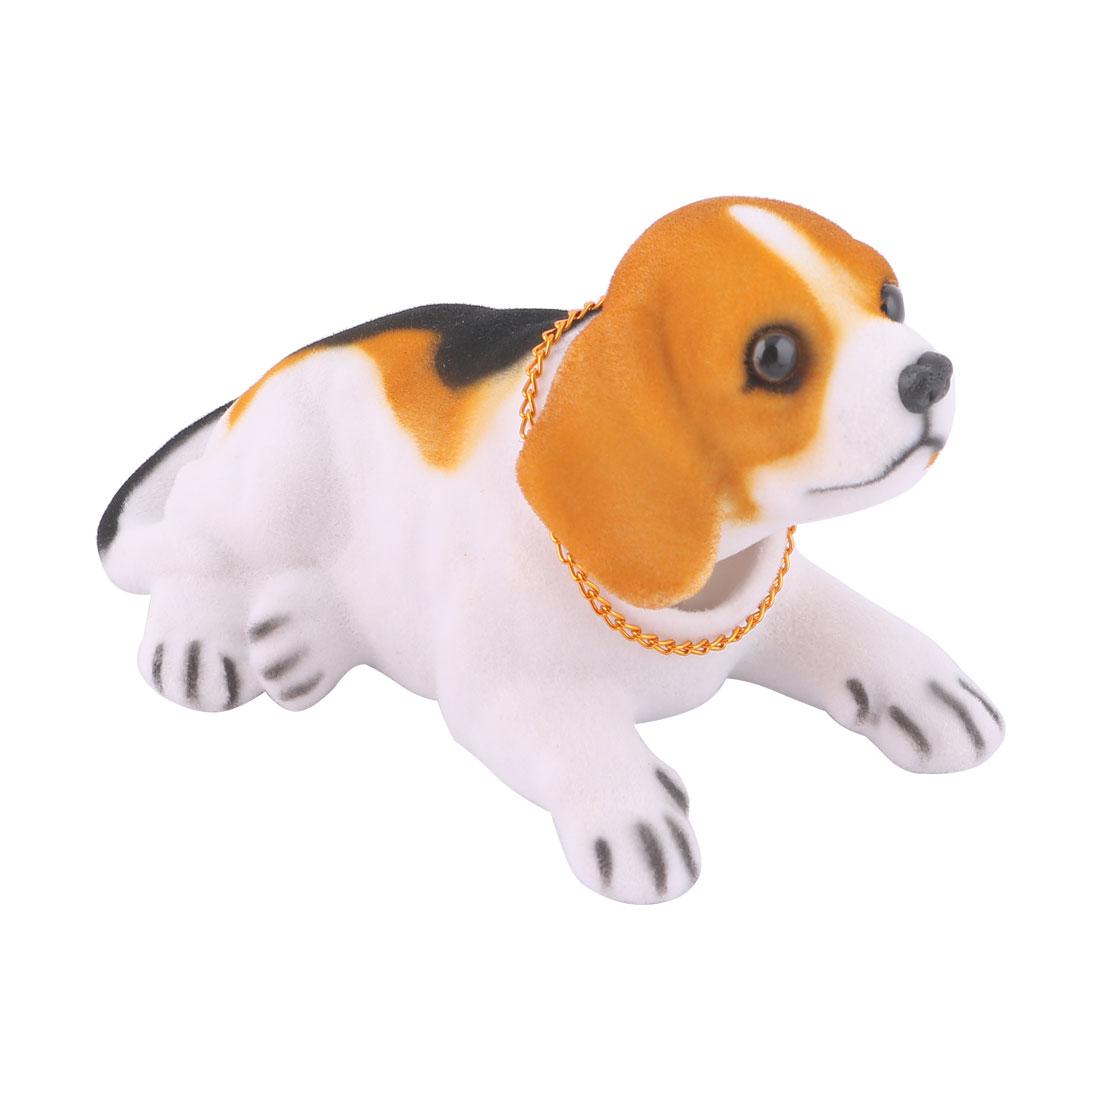 Car Decoration Bobbing Head Beagle Design Nodding Dog Black White Brown